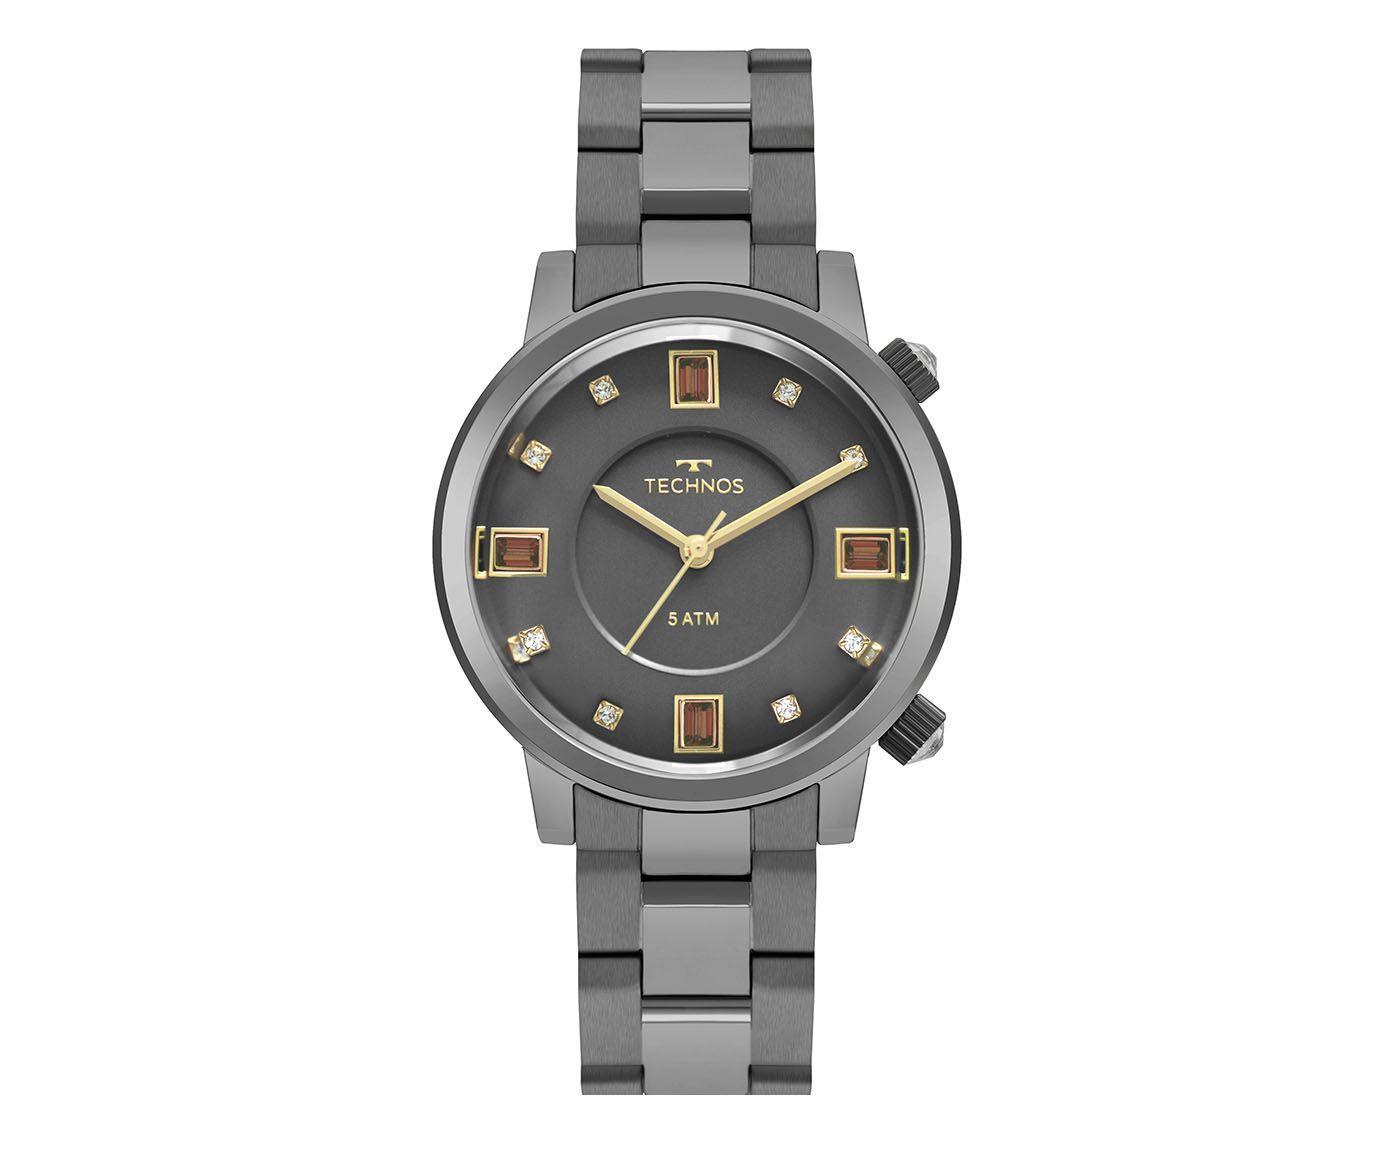 Relógio Analógico Technos | Westwing.com.br